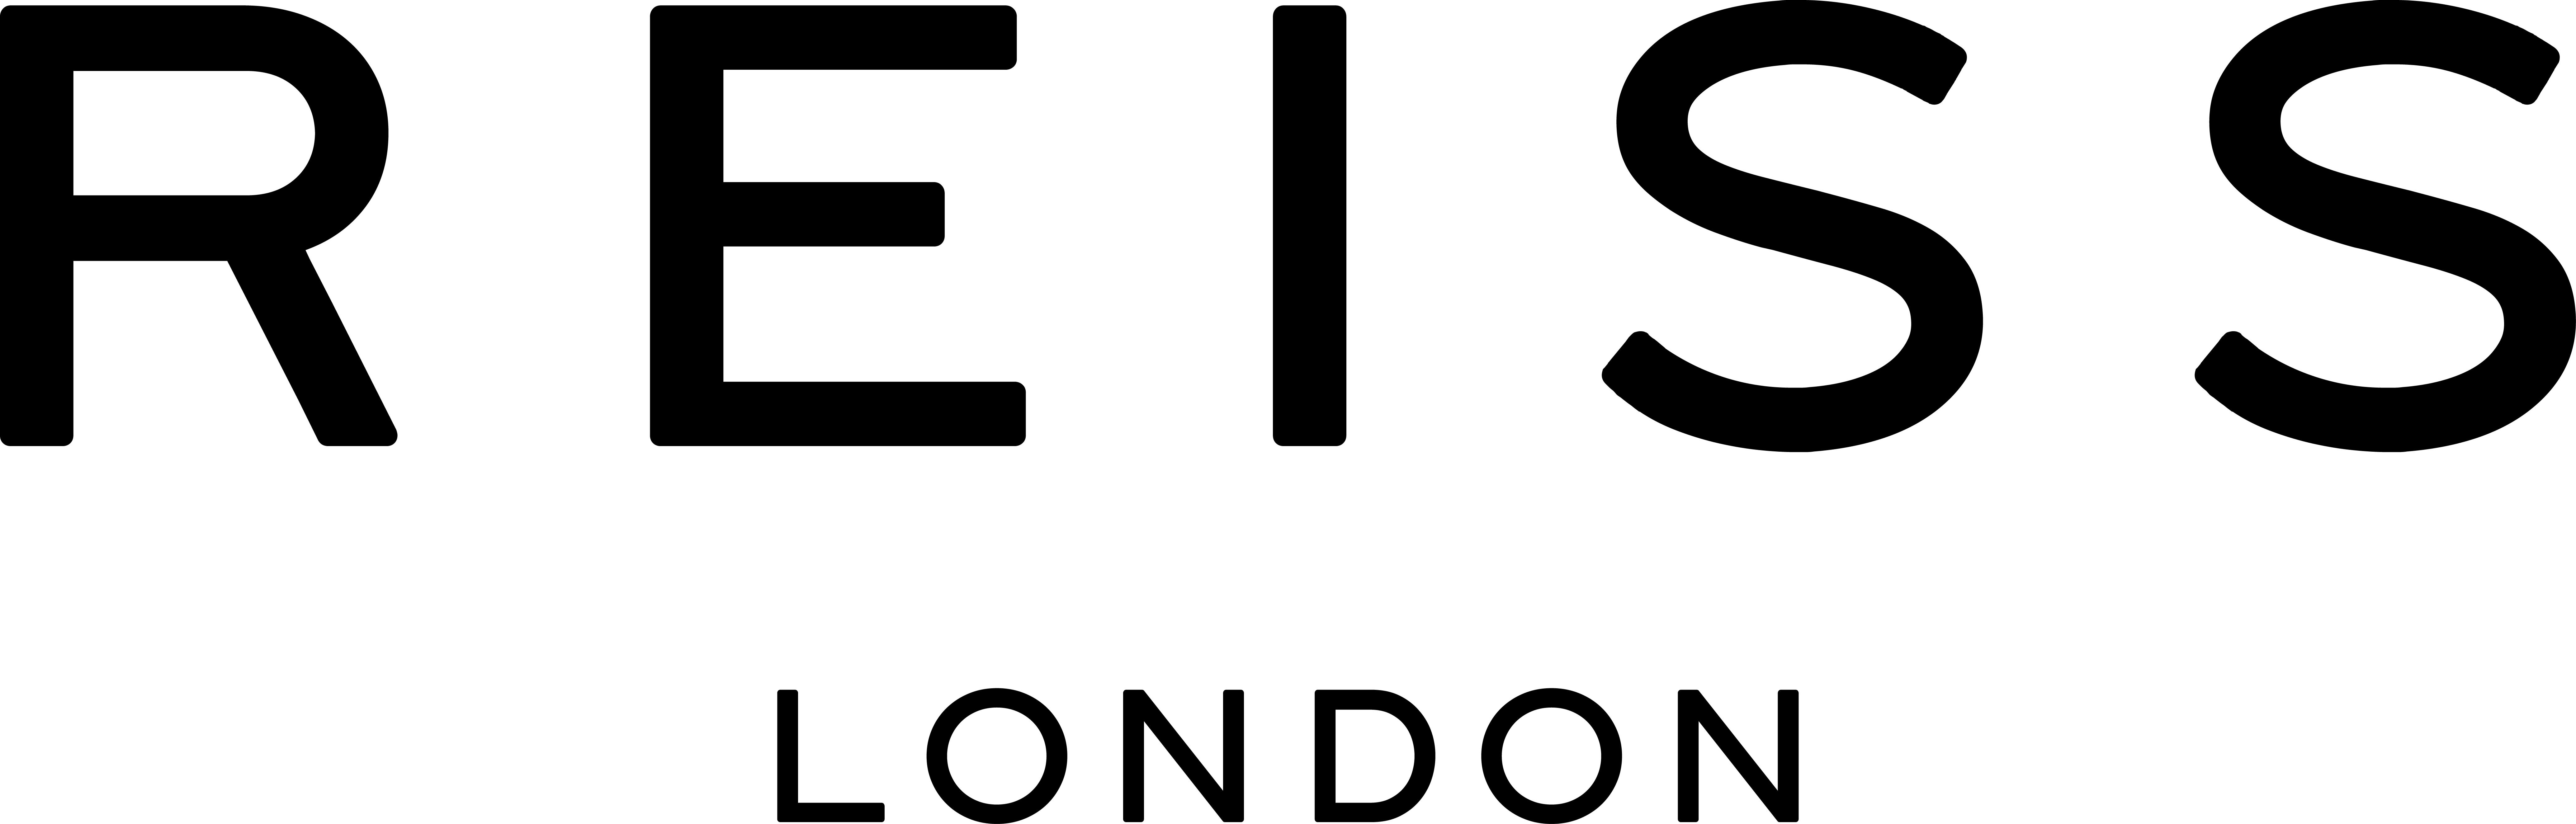 REISS LONDON LOGO